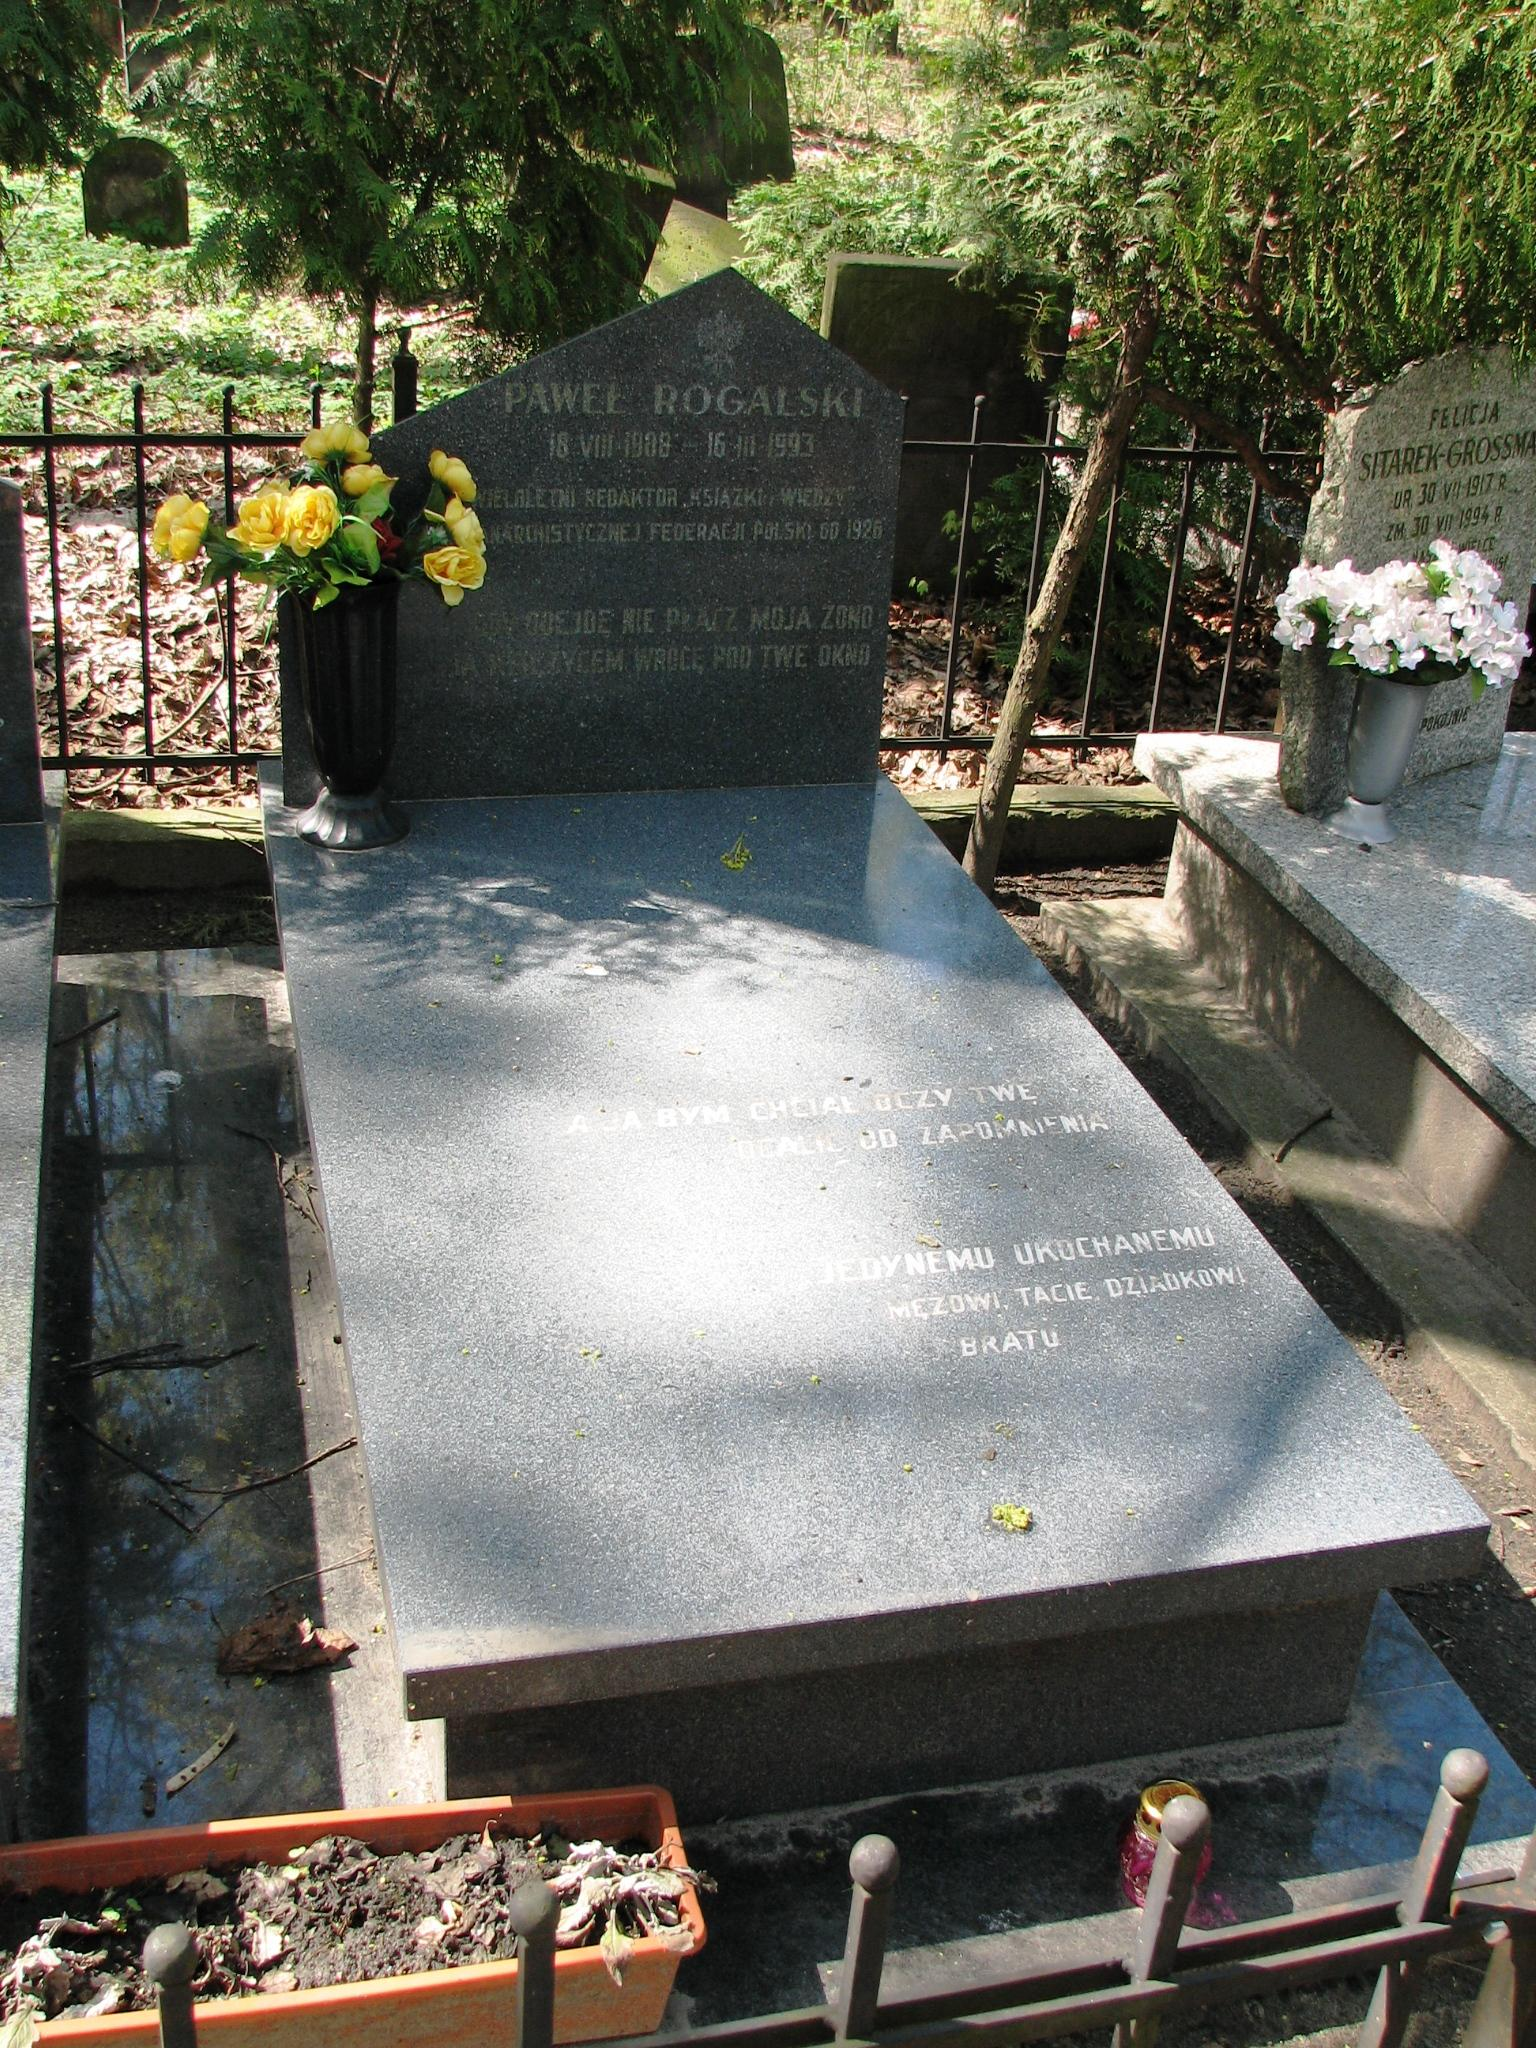 Tomba de Pawel Rogalski al cementiri jueu d'Okopowa de Varsòvia